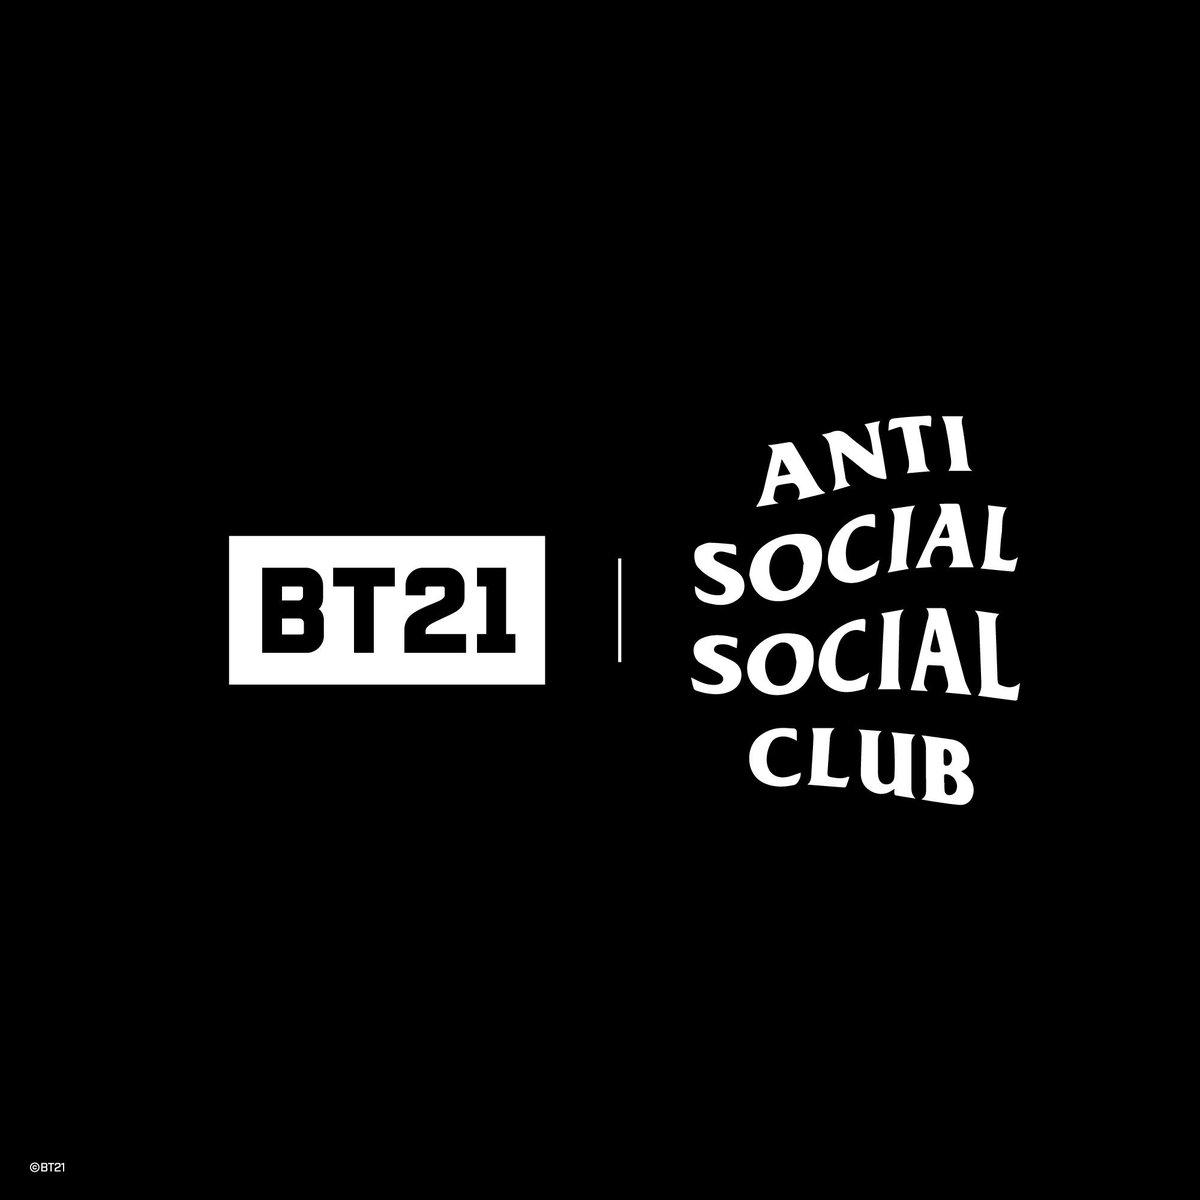 Saturday Nov 17th 8AM PST (Pacific Standard Time) Worldwide Release Online BT21CLUB.COM #BT21Club #BT21 #ASSC